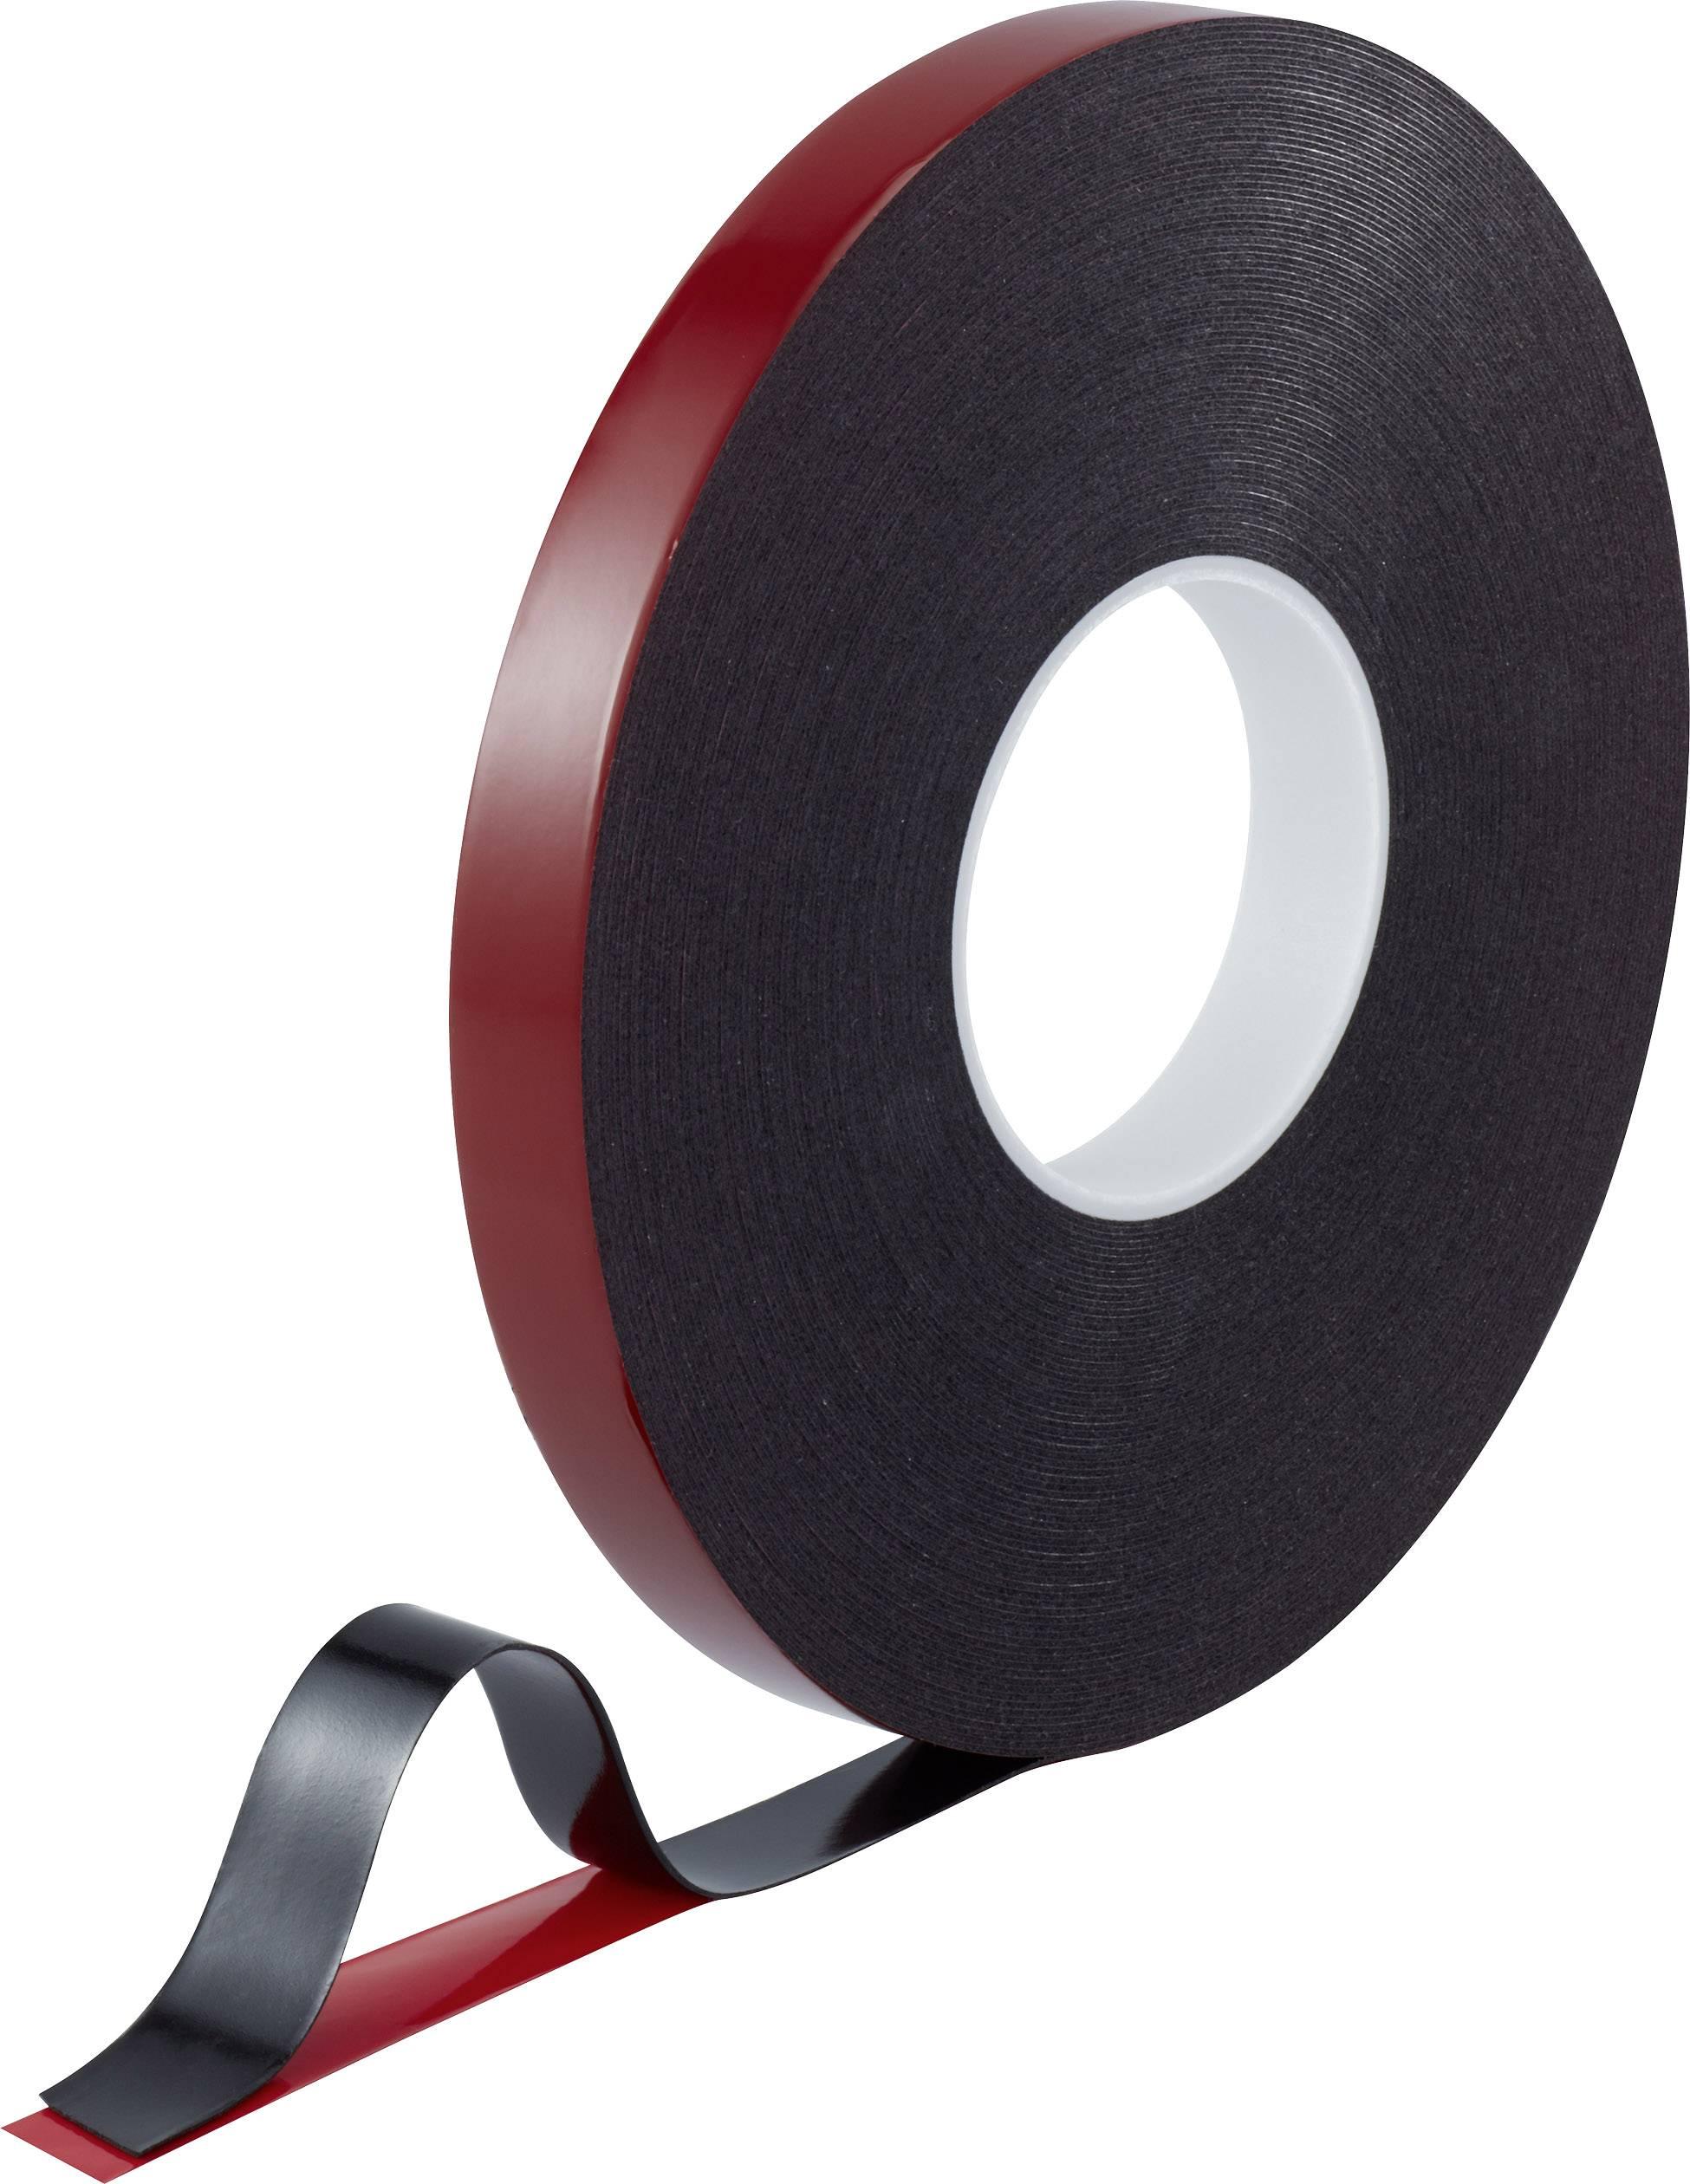 Obojstranná lepiaca páska TOOLCRAFT 93038c185 93038c185, (d x š) 30 m x 20 mm, červená/čierna, 1 roliek